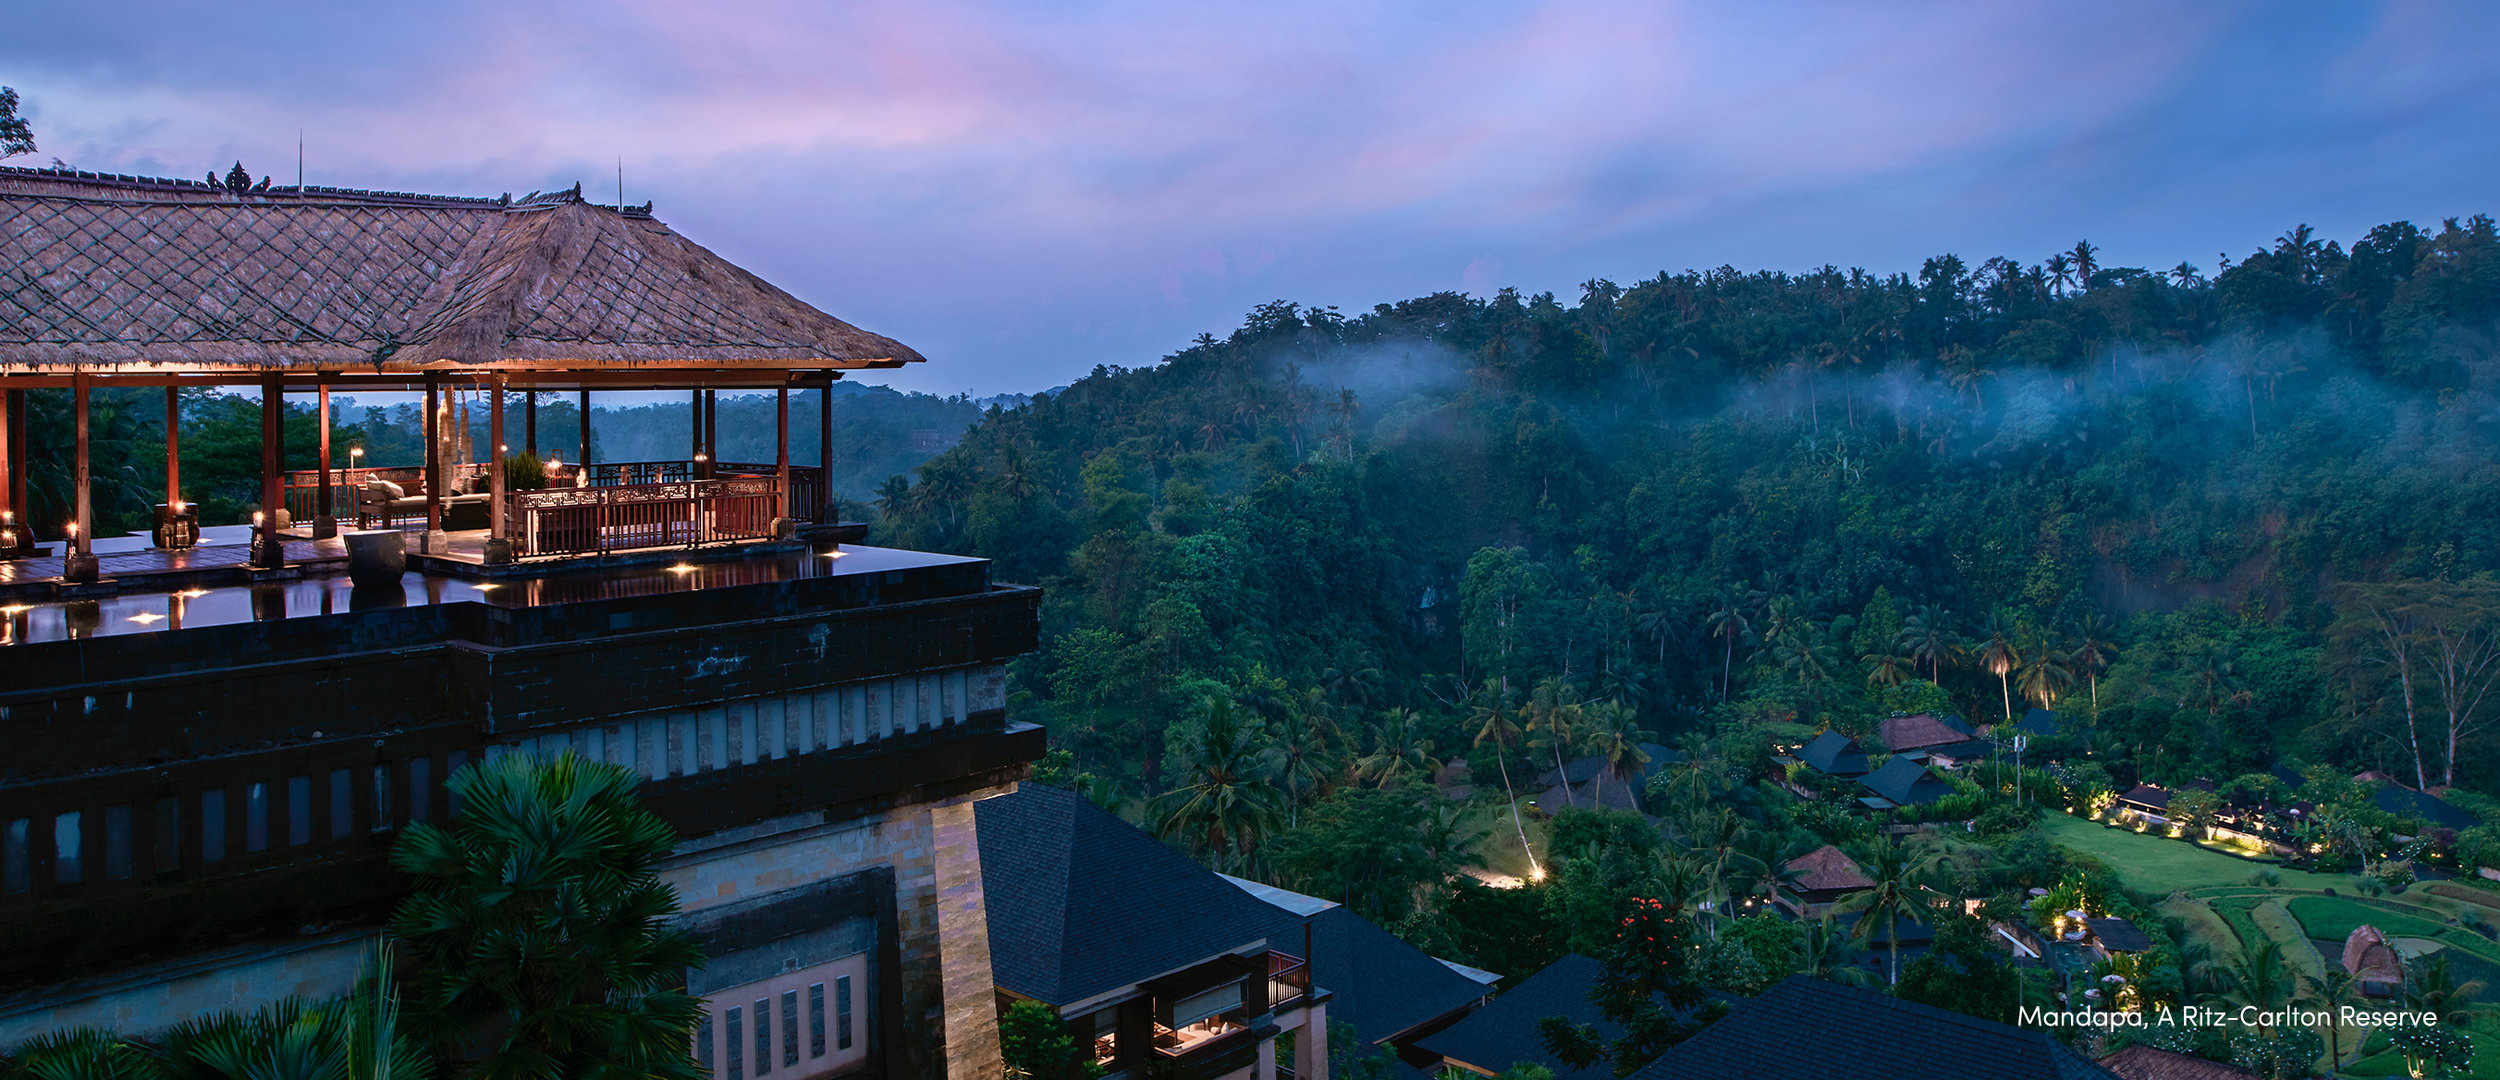 Mandapa,-A-Ritz-Carlton-Reserve_Slideshow.jpg